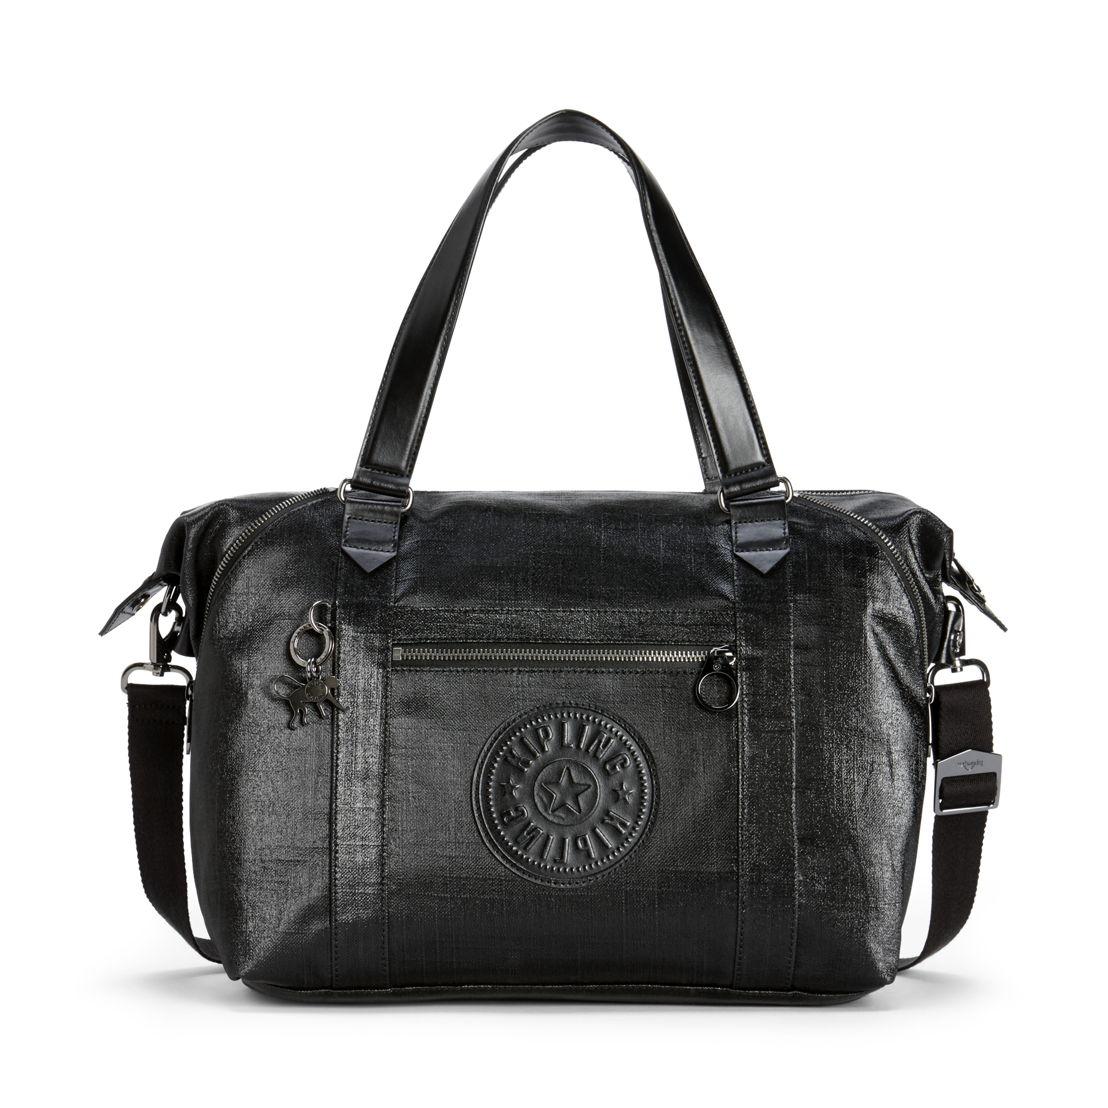 ART ORGANISED Coated Black – Shopper Tote mit herausnehmbaren Taschen  - 219.99€